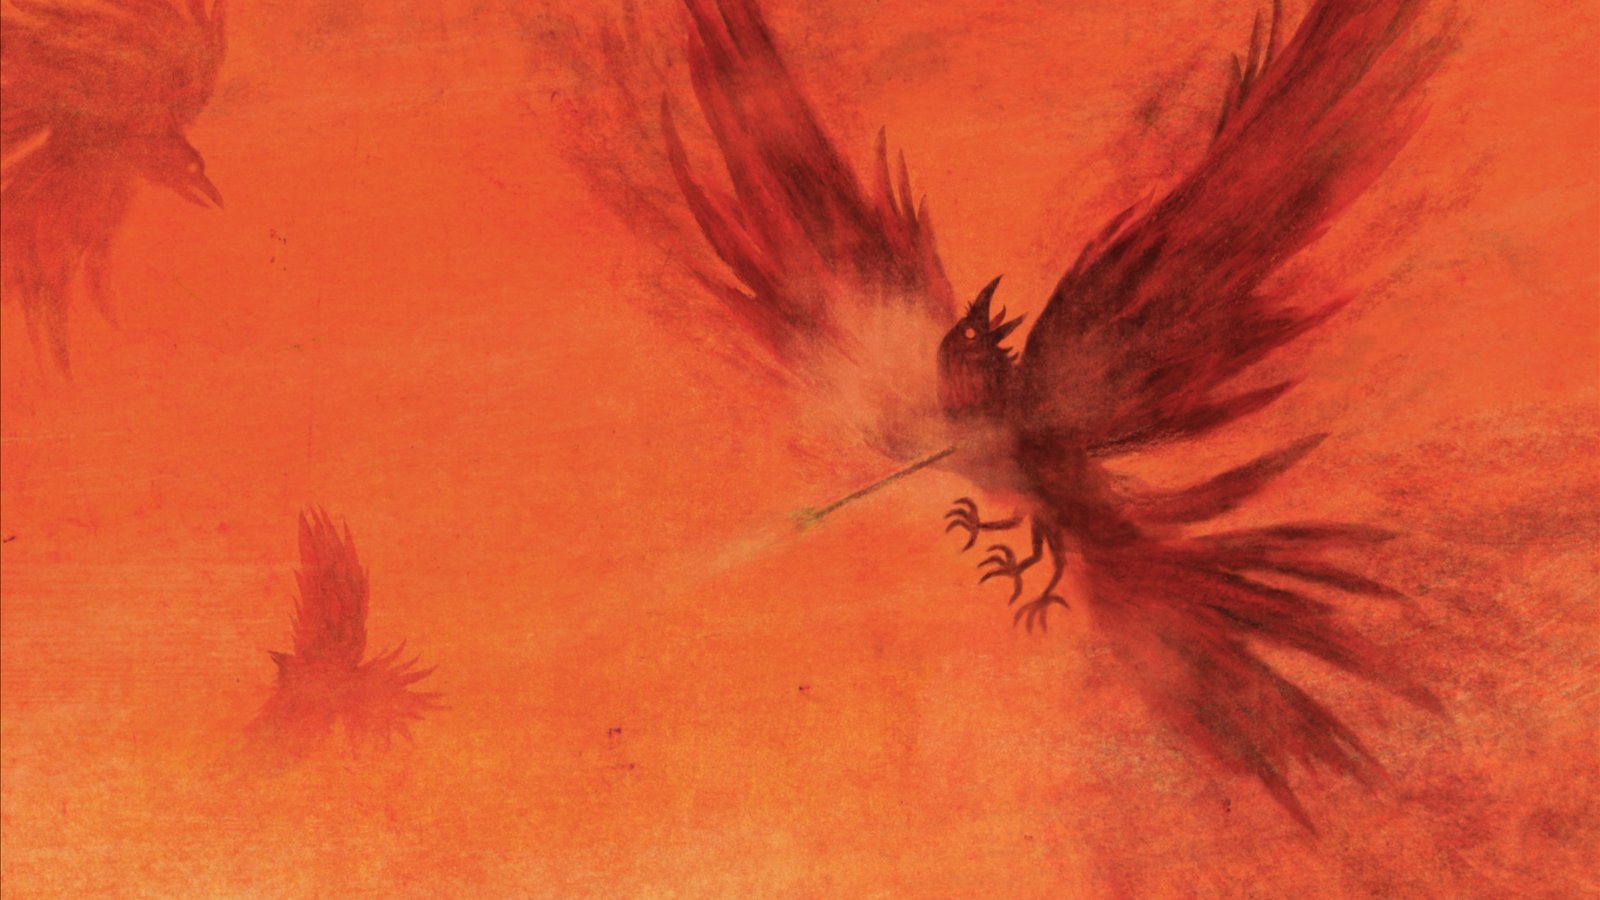 Alas de tiniebla (Wings of Darkness)